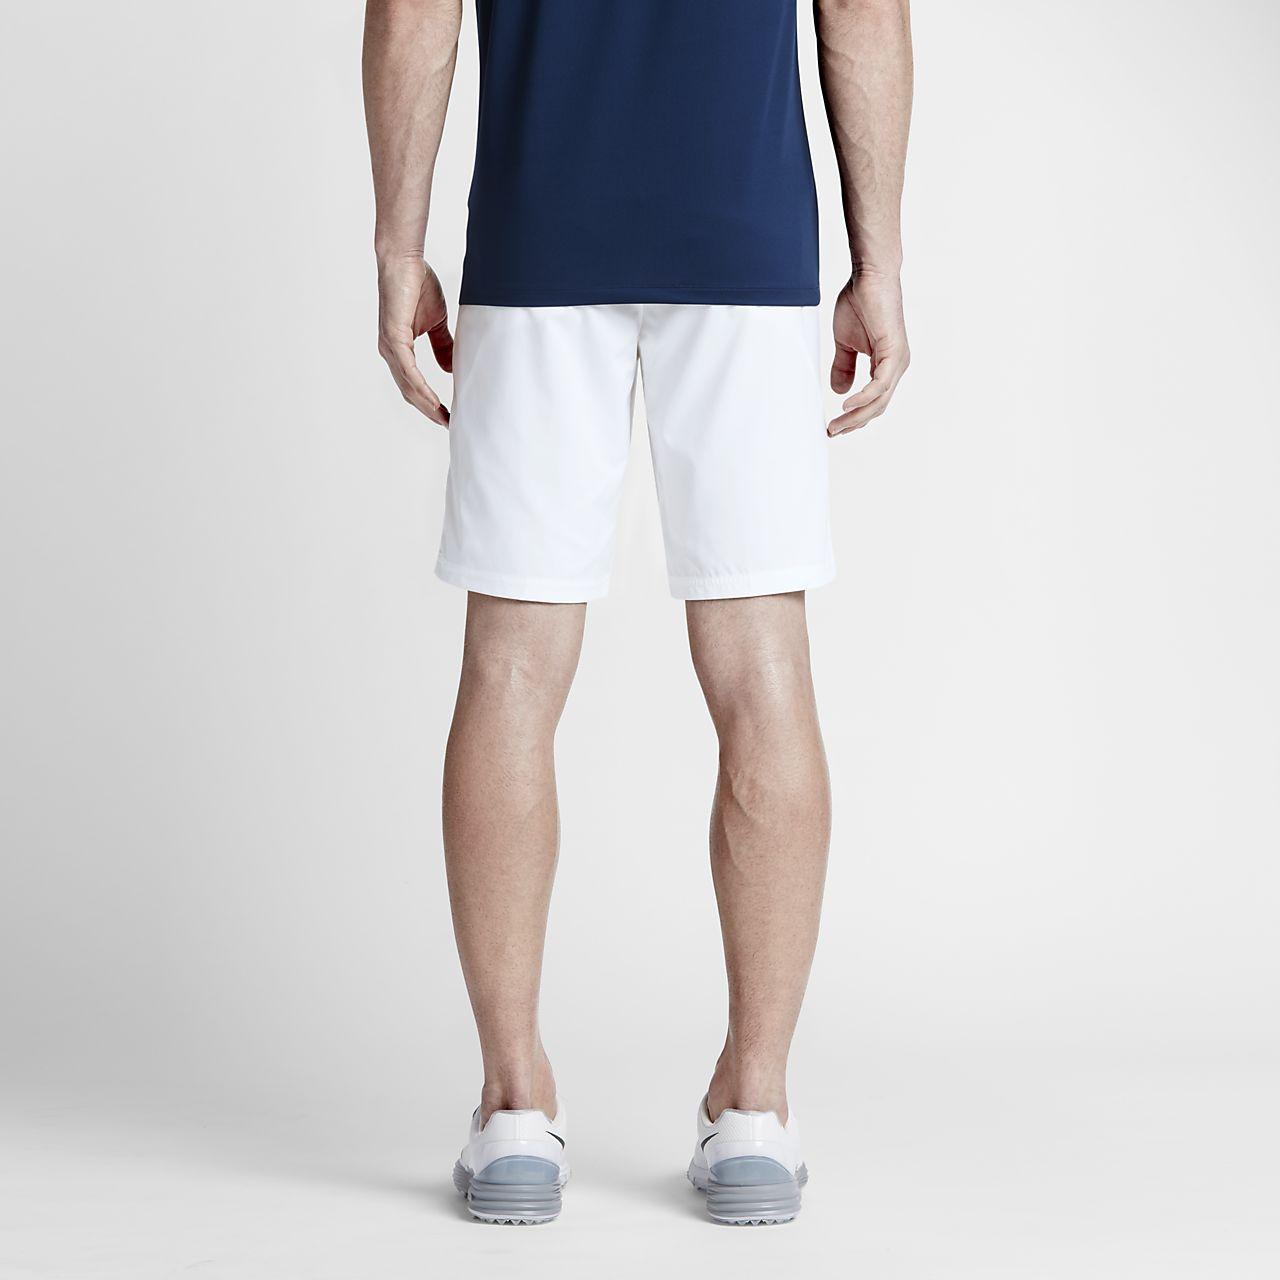 ... Nike Modern Tech Woven Men's Golf Shorts